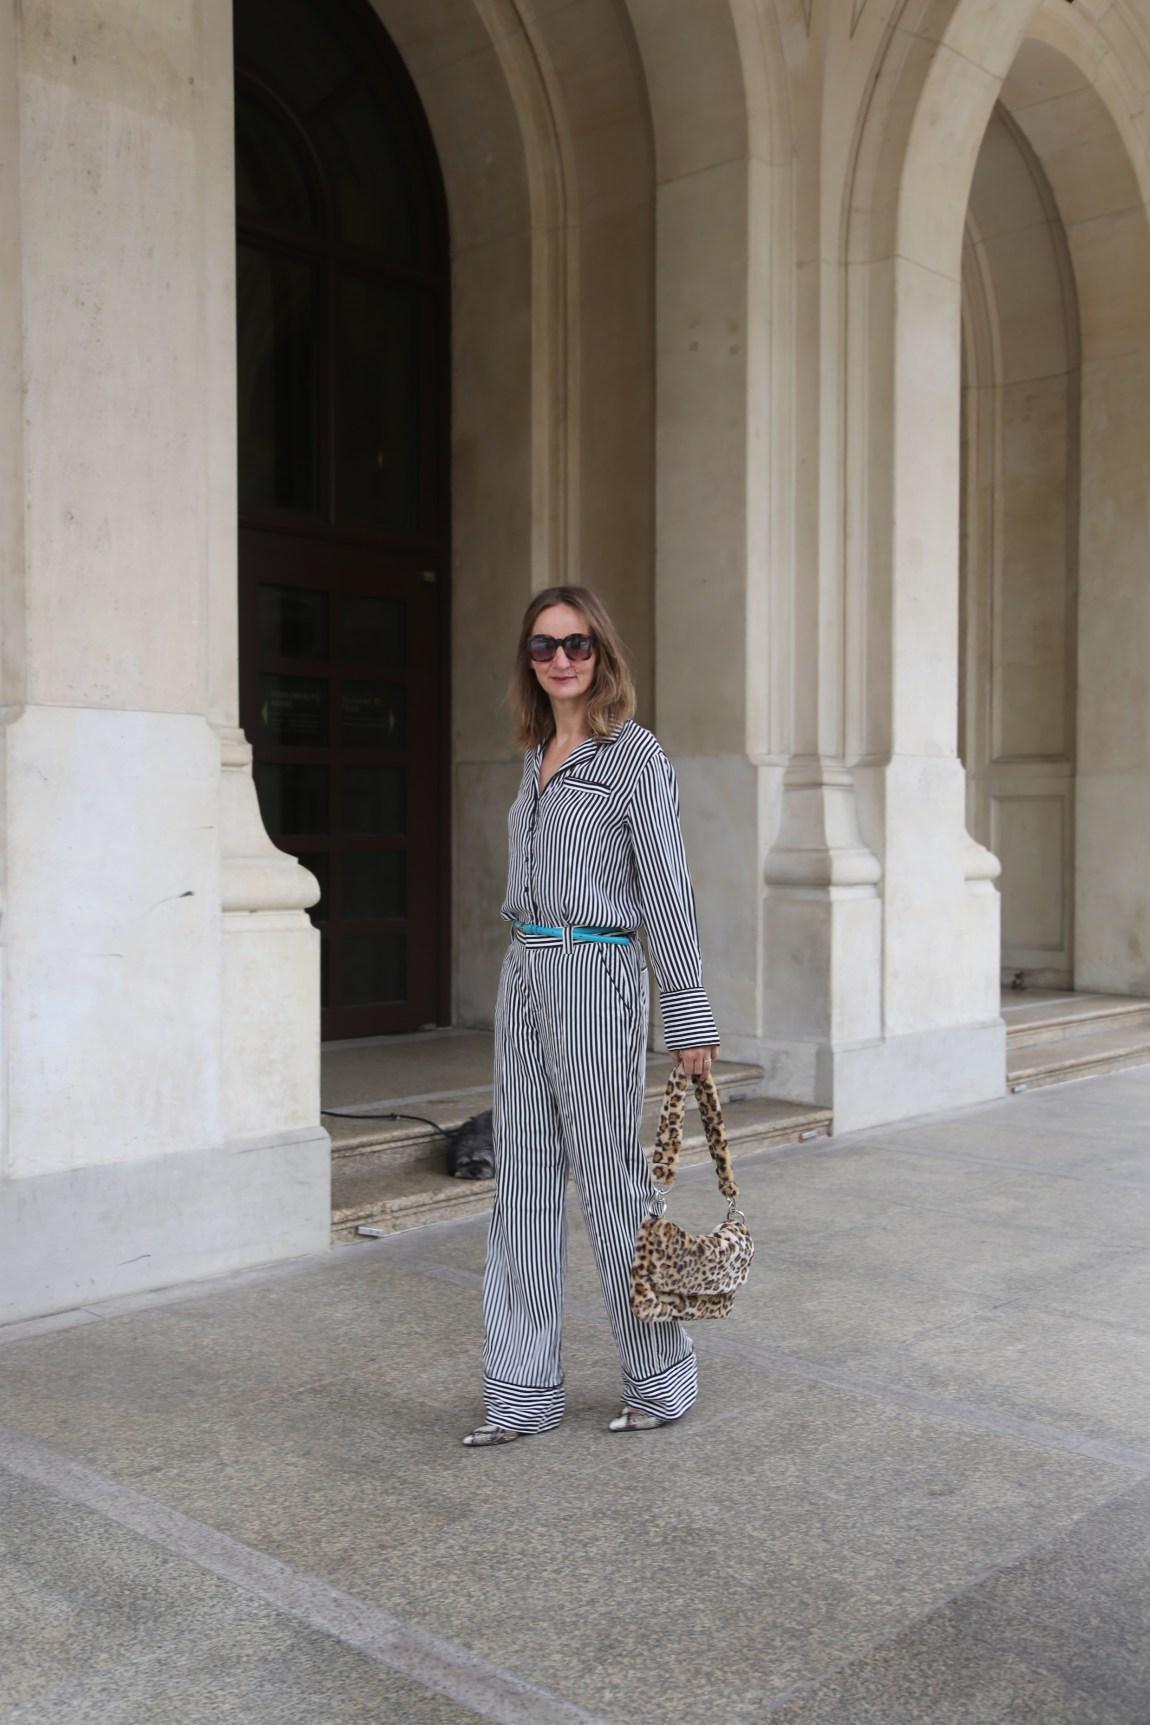 pyjama-look-2018_trend_weite-hose-streifen-bluse_pyjama-stil_mode-blog-ue50_frankfurt_influencer_oceanblue-style (2)-02